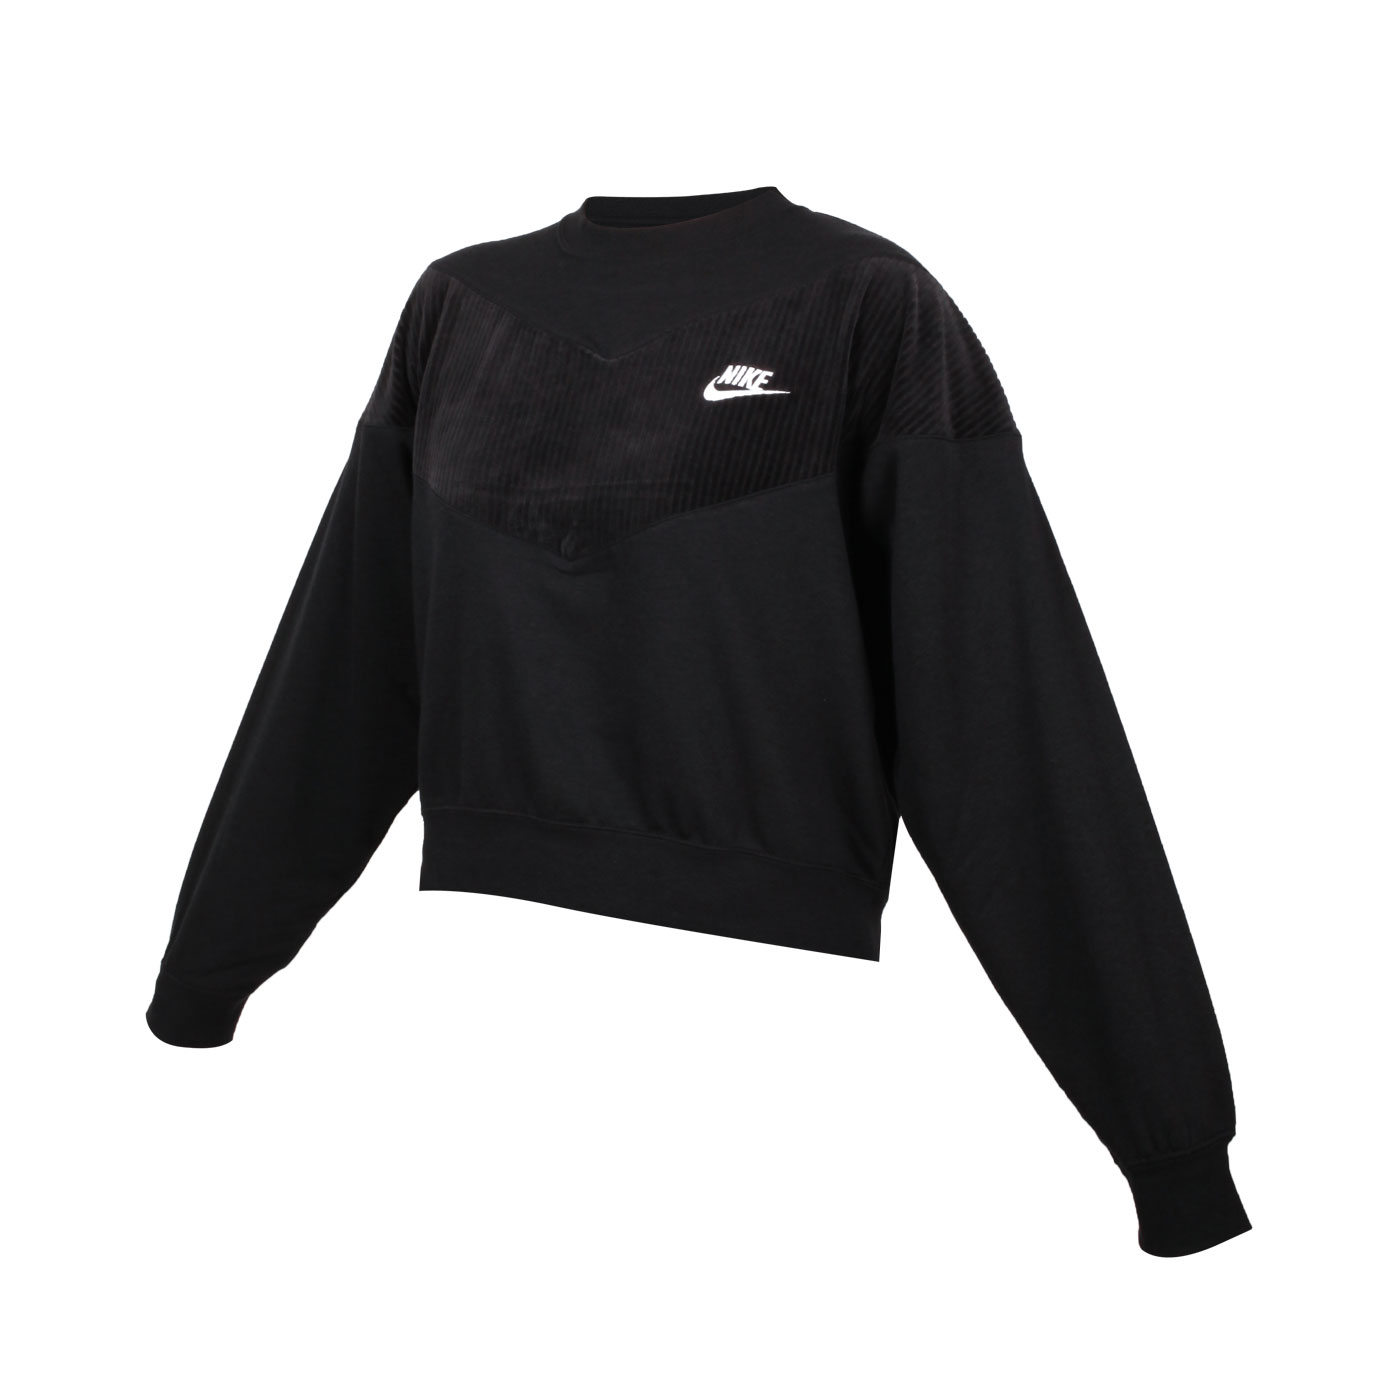 NIKE 女款長袖T恤 CZ1877-010